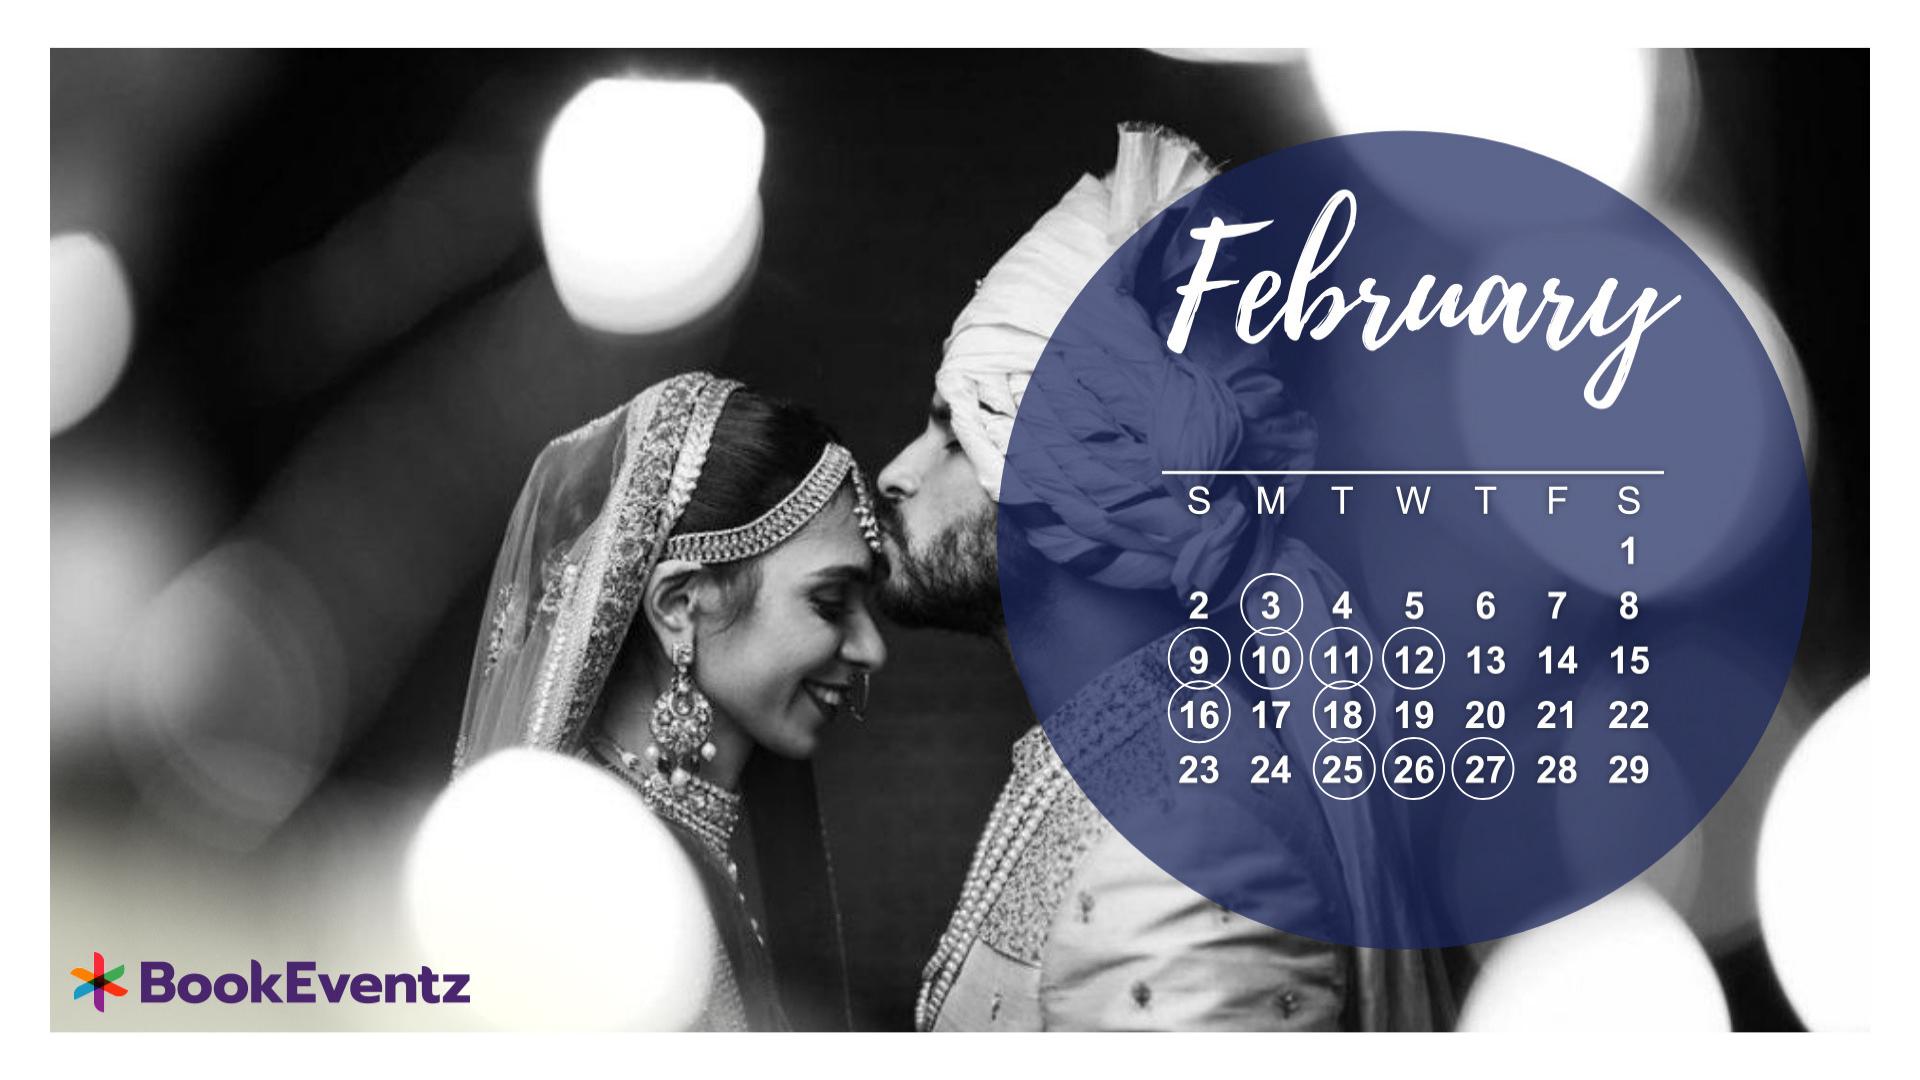 Shubh muhurat, Marriage dates in 2020, 2020 marriage dates, Wedding dates 2020, Hindu calendar 2020, Marriage muhurat in 2020, hindu calendar 2020, shadi muhurat in 2020, weddings dates 2020, hindu marriage dates 2020, lagna muhurat in 2020